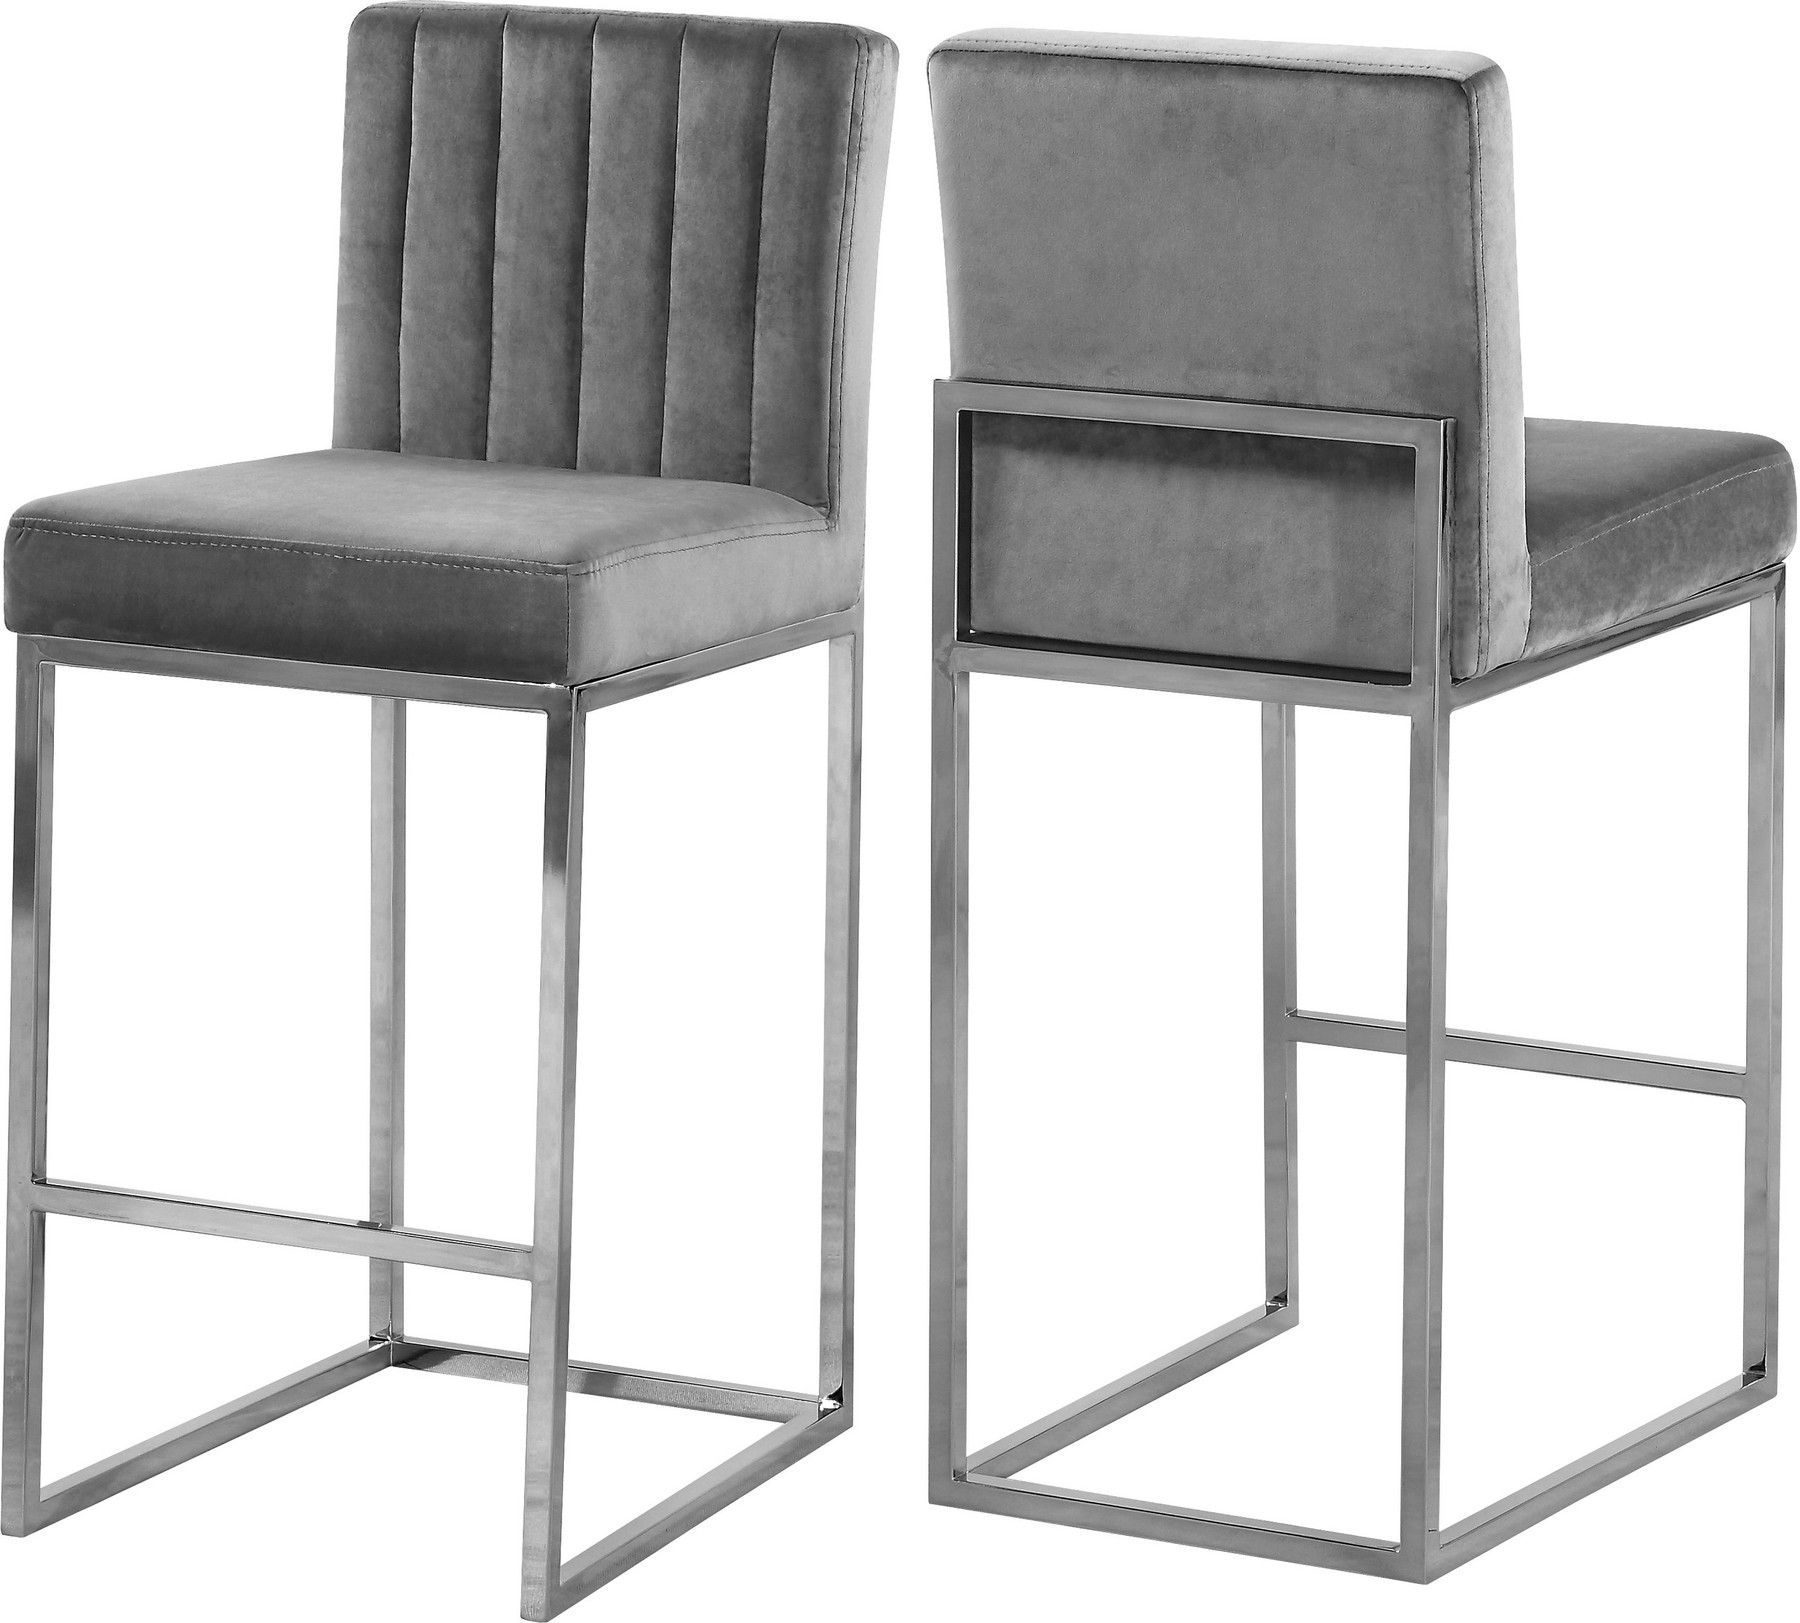 Giselle Ii Gray Bar Stool 782 Meridian Furniture Bar Tables Grey Bar Stools Contemporary Bar Stools Meridian Furniture